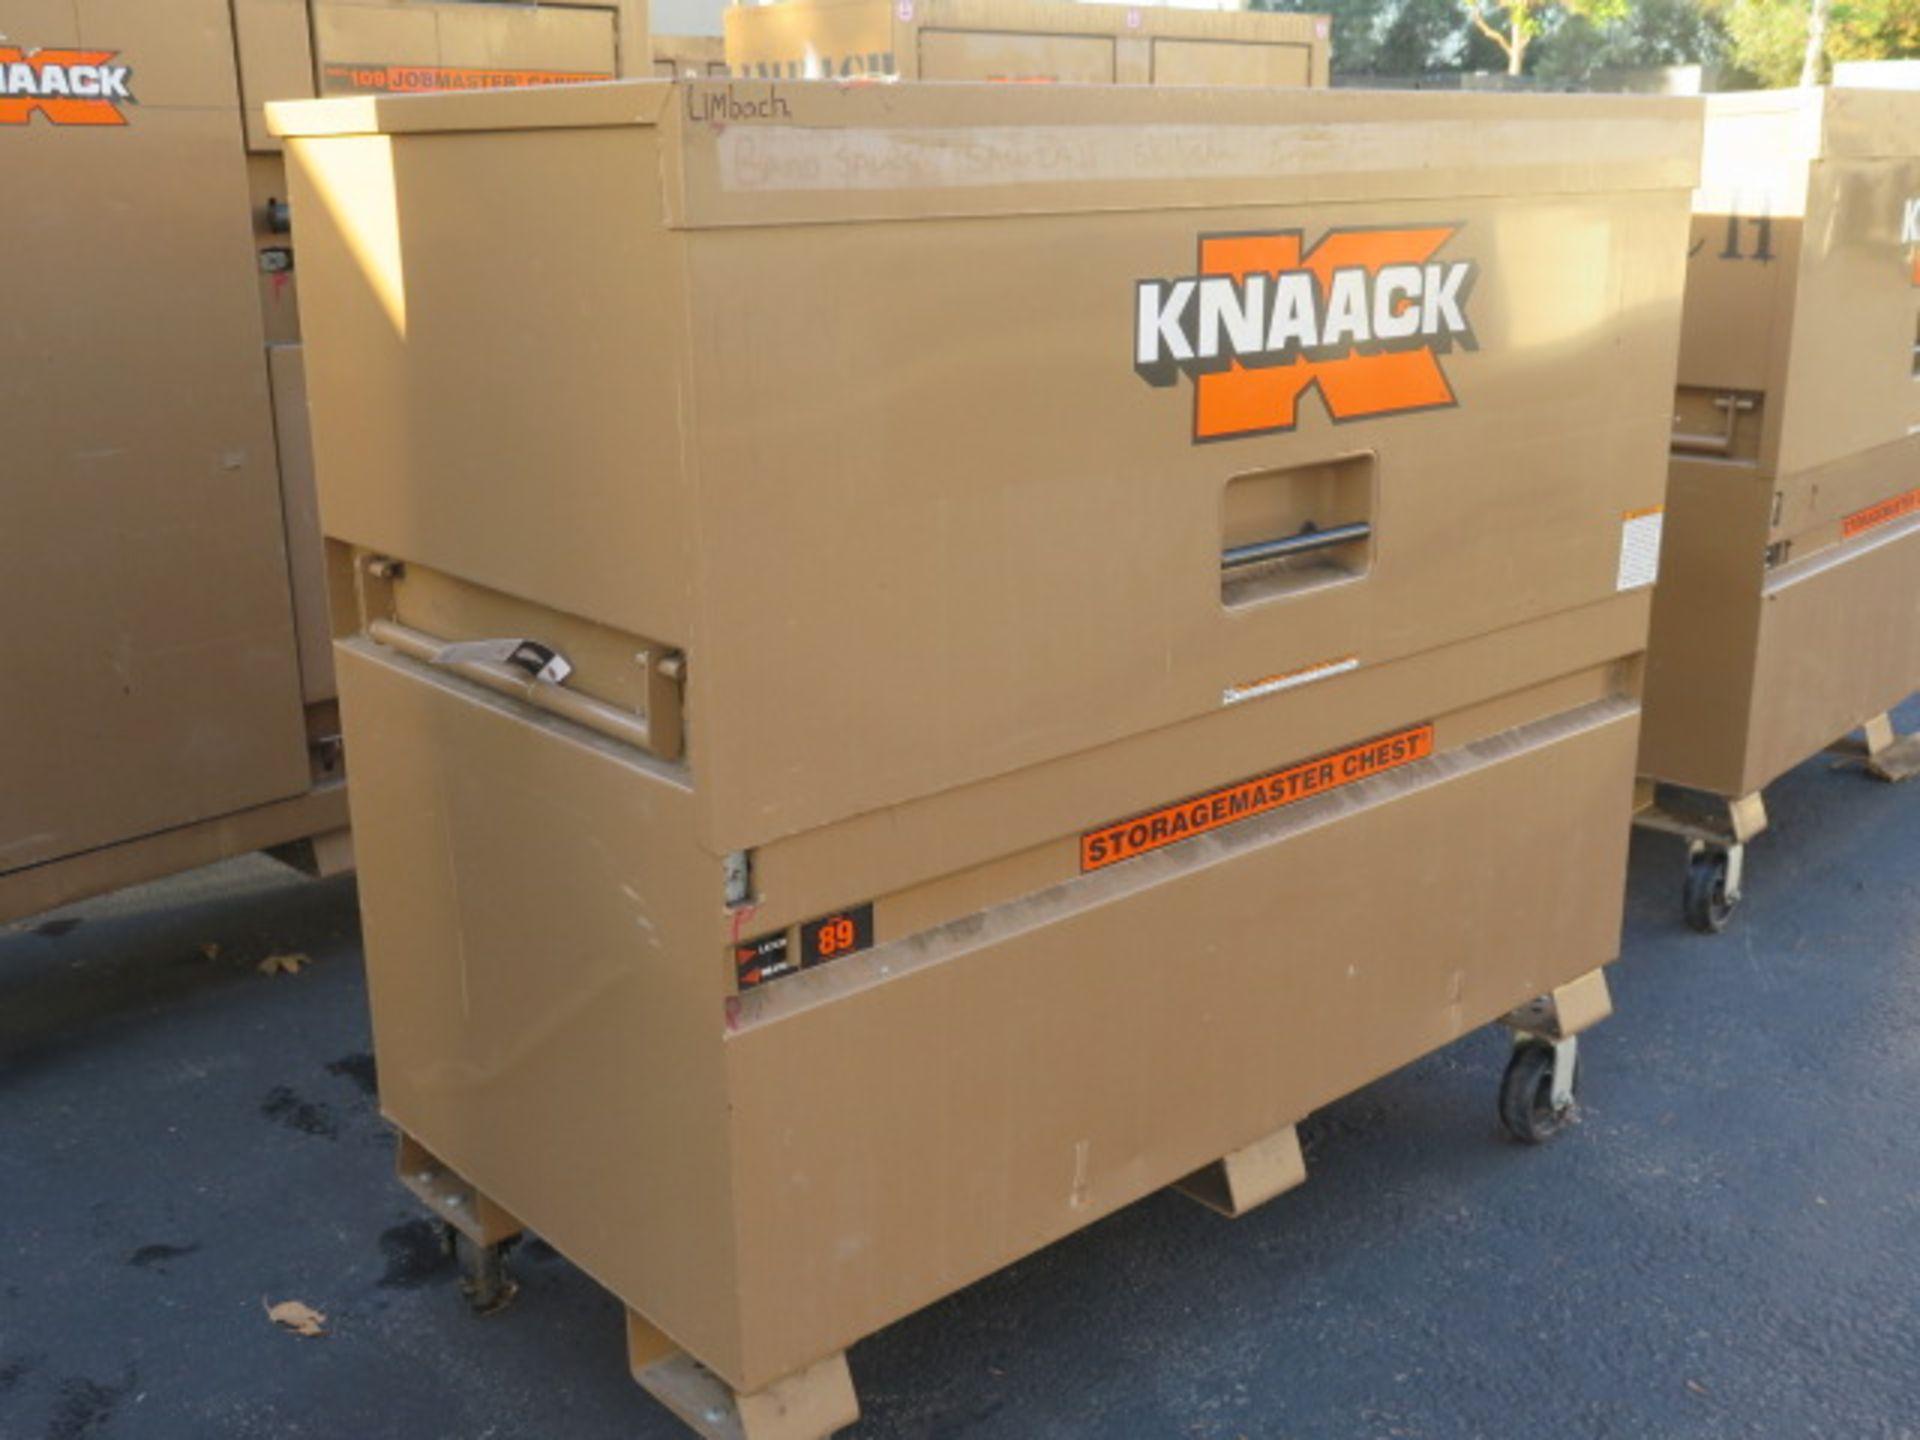 Knaack mdl. 89 Storagemaster Rolling Job Box (SOLD AS-IS - NO WARRANTY) - Image 2 of 11